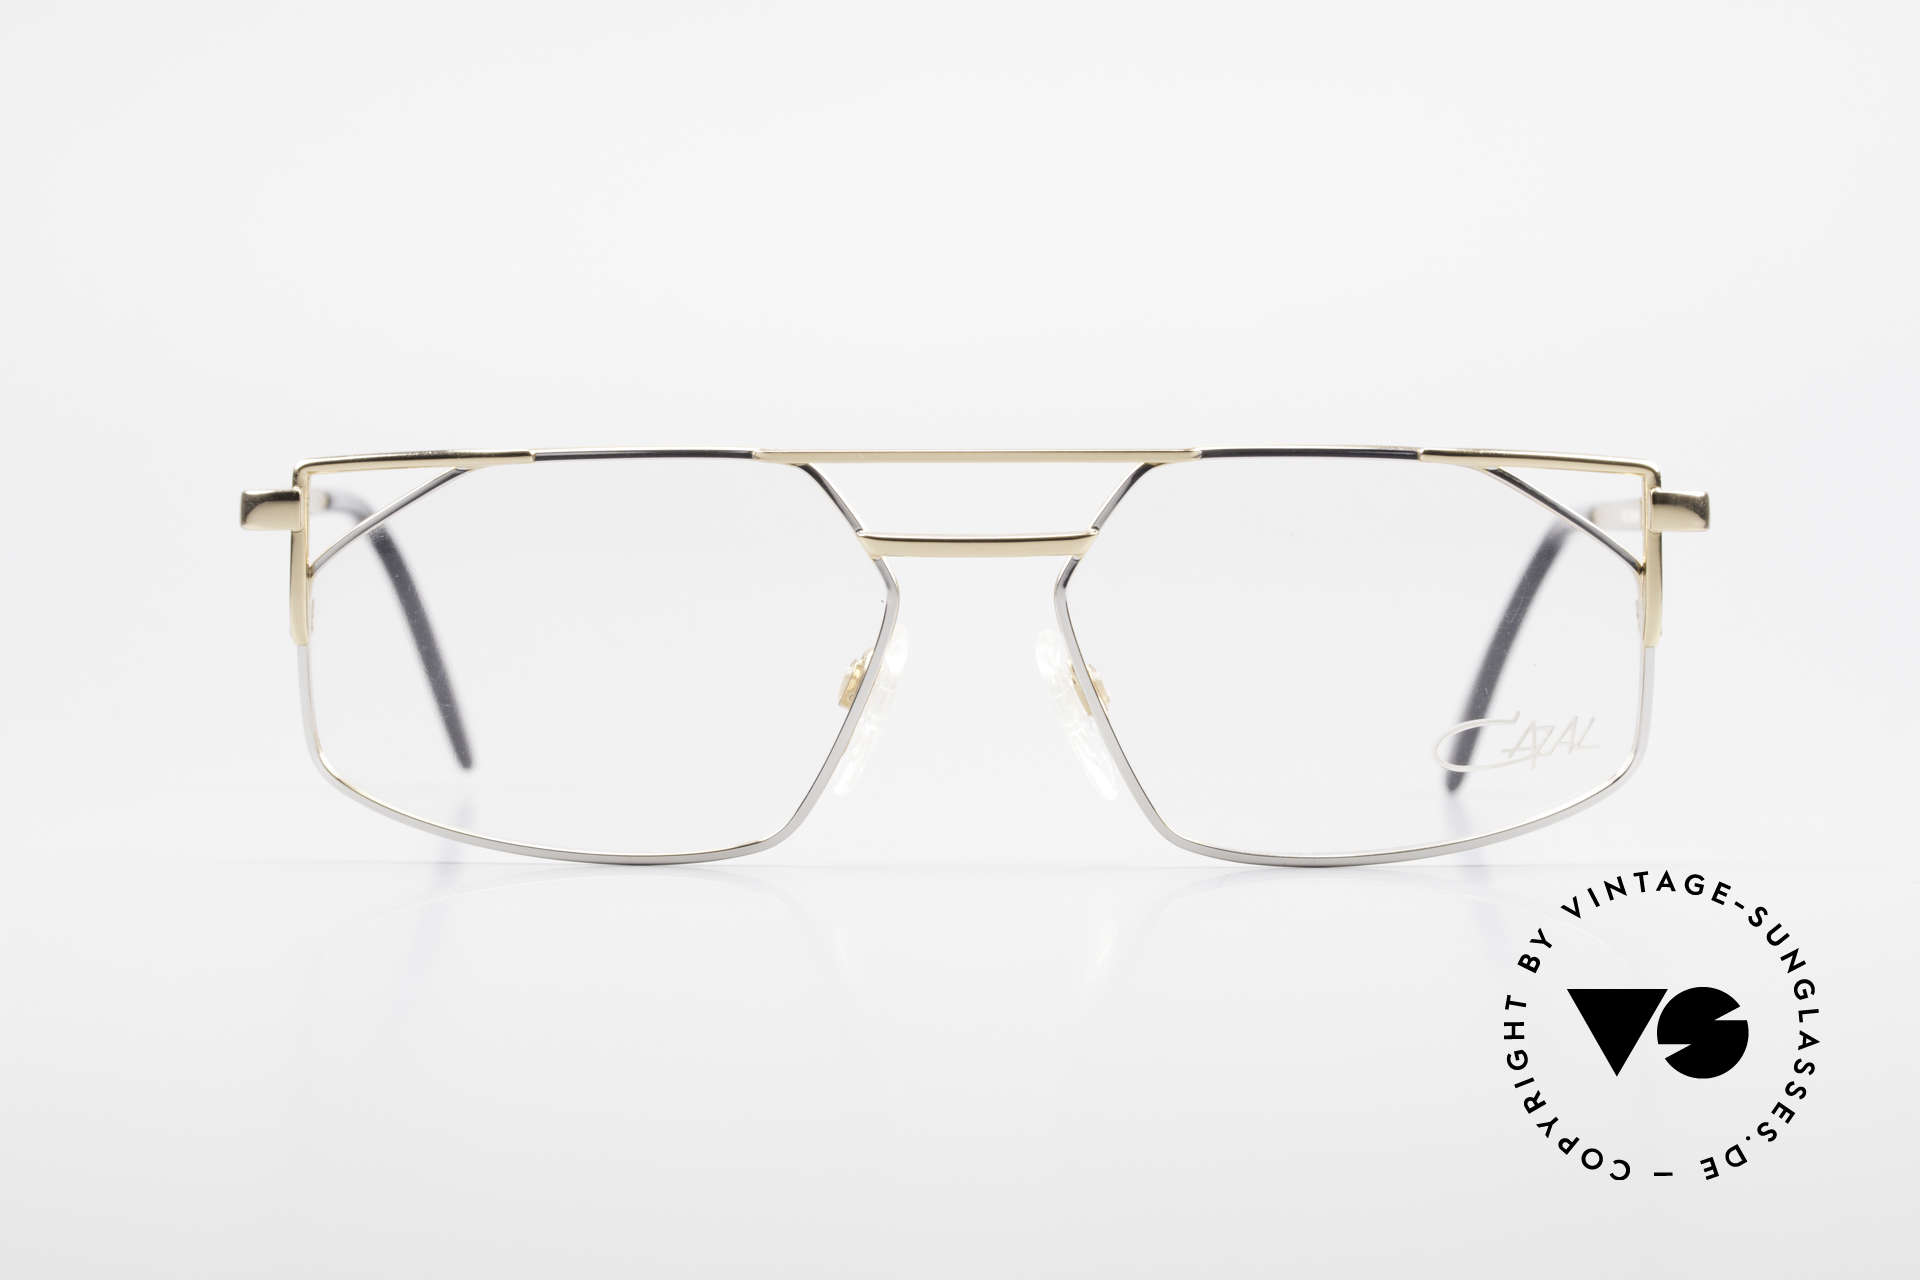 Cazal 751 Old 90's Designer Eyeglasses, top-notch eyeglass-frame by CAZAL from 1993/94, Made for Men